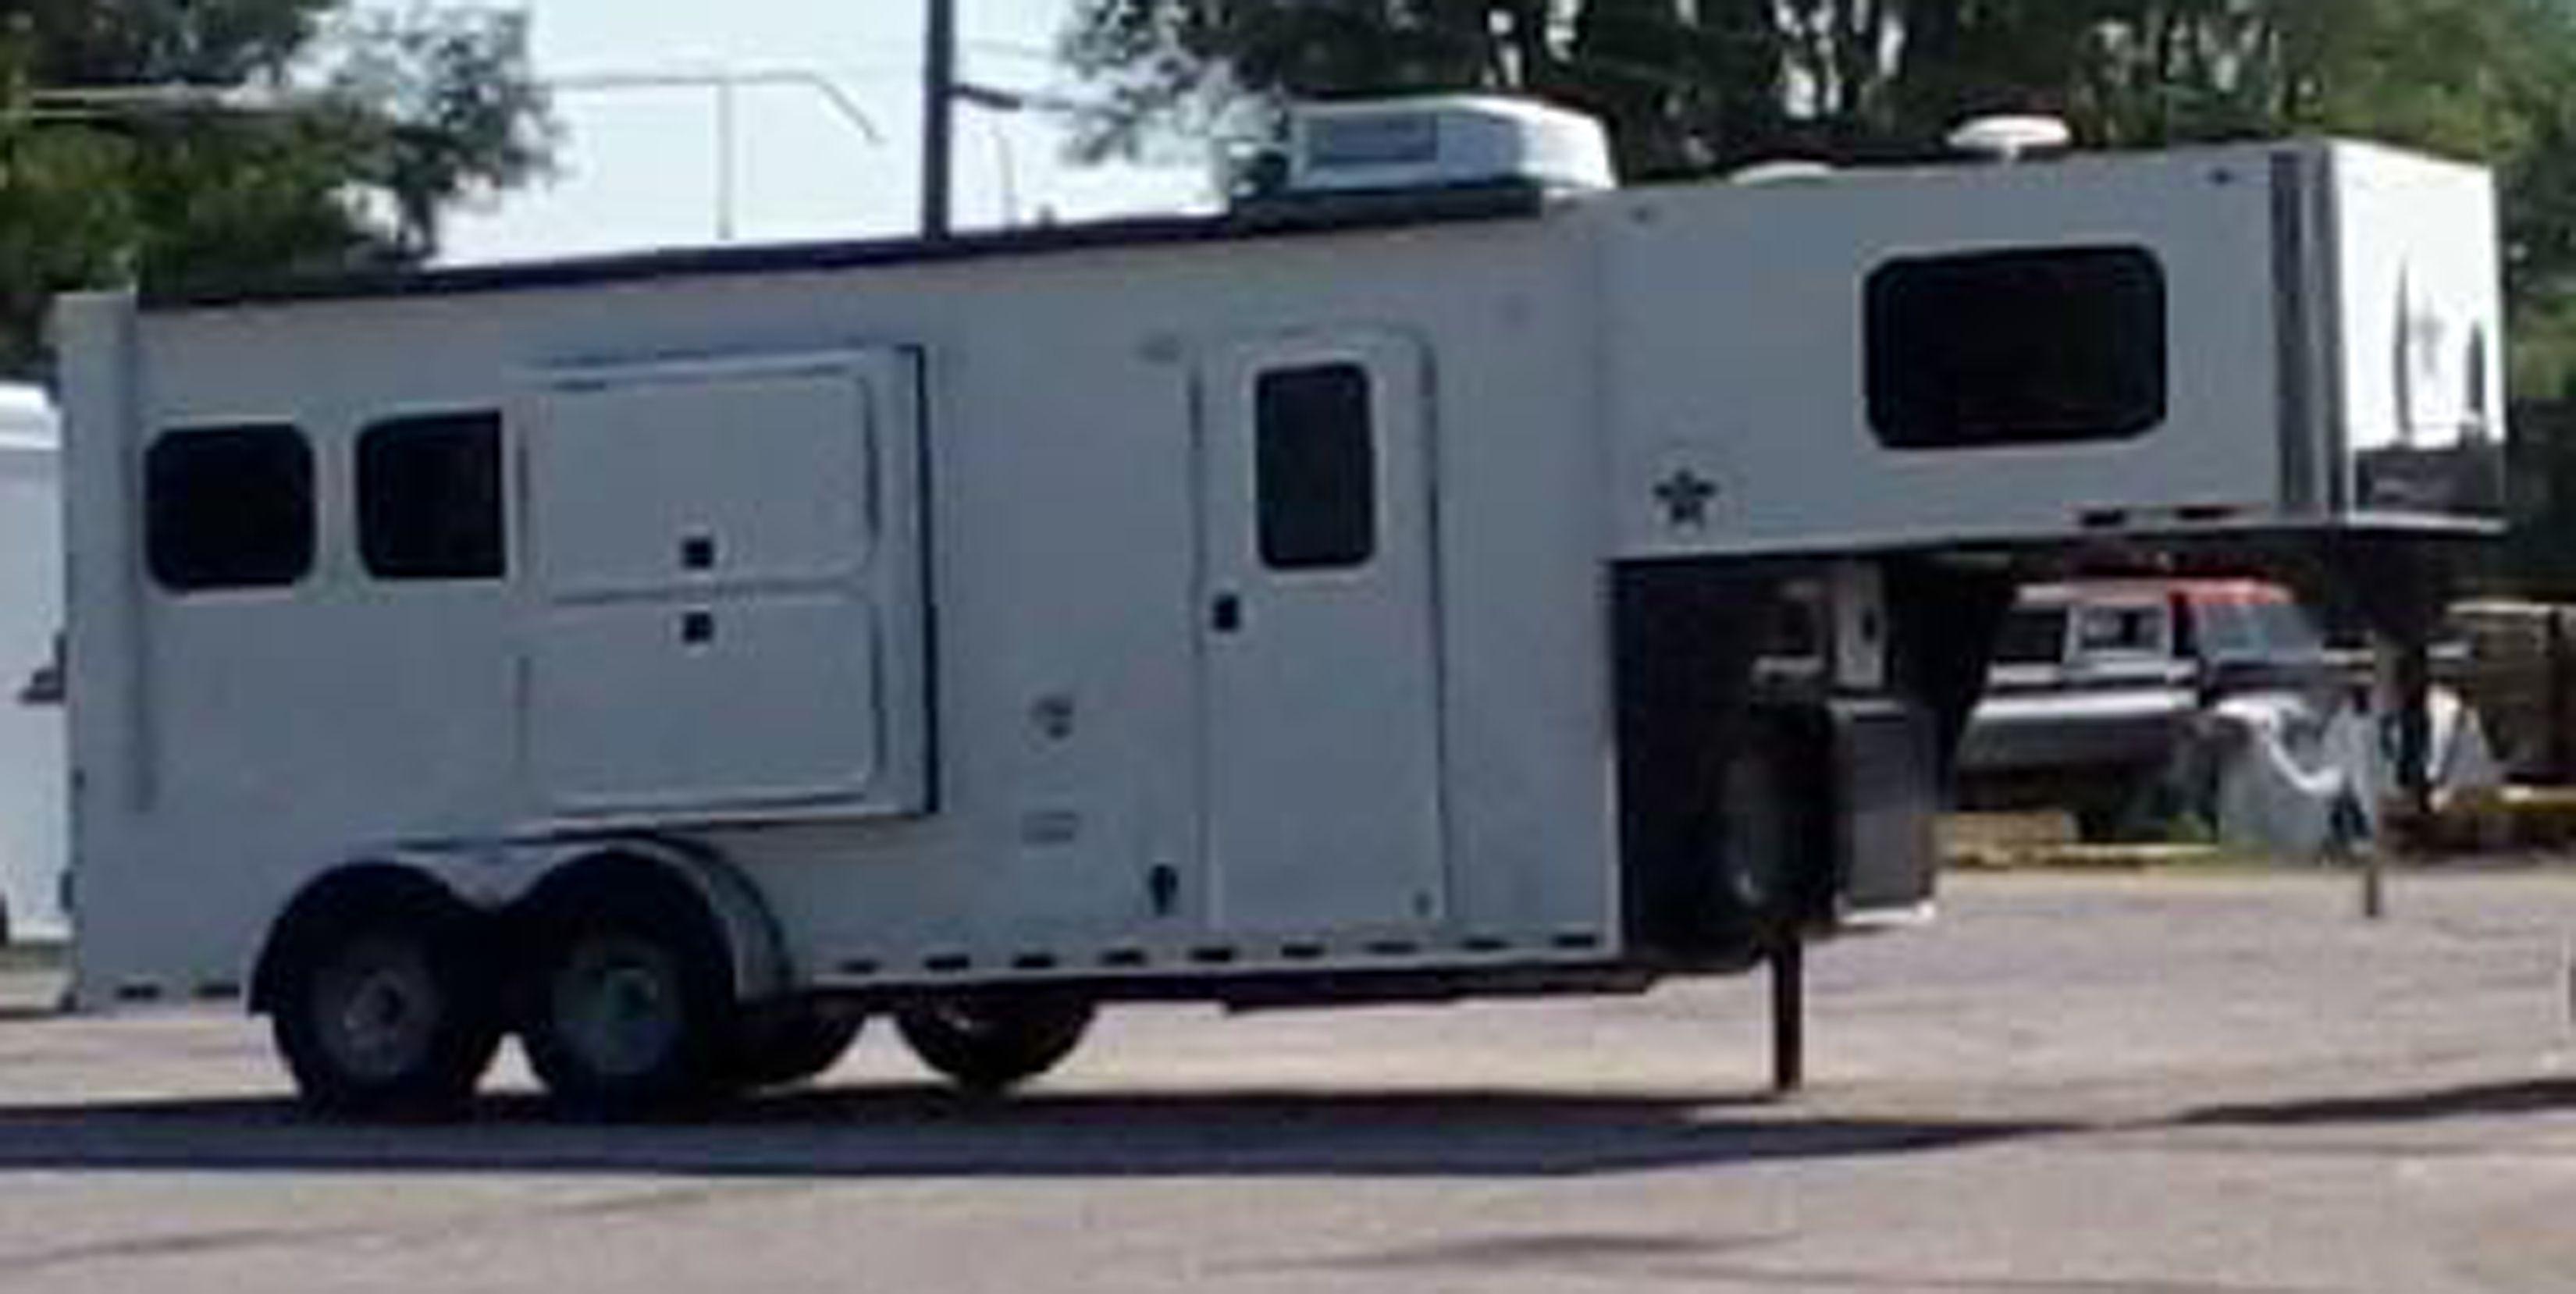 6 Living Quarters 2h Gooseneck Demo Horse Trailer For Sale Serious Inquiries Contact Montanahorse Horse Trailers For Sale Horse Trailer Recreational Vehicles